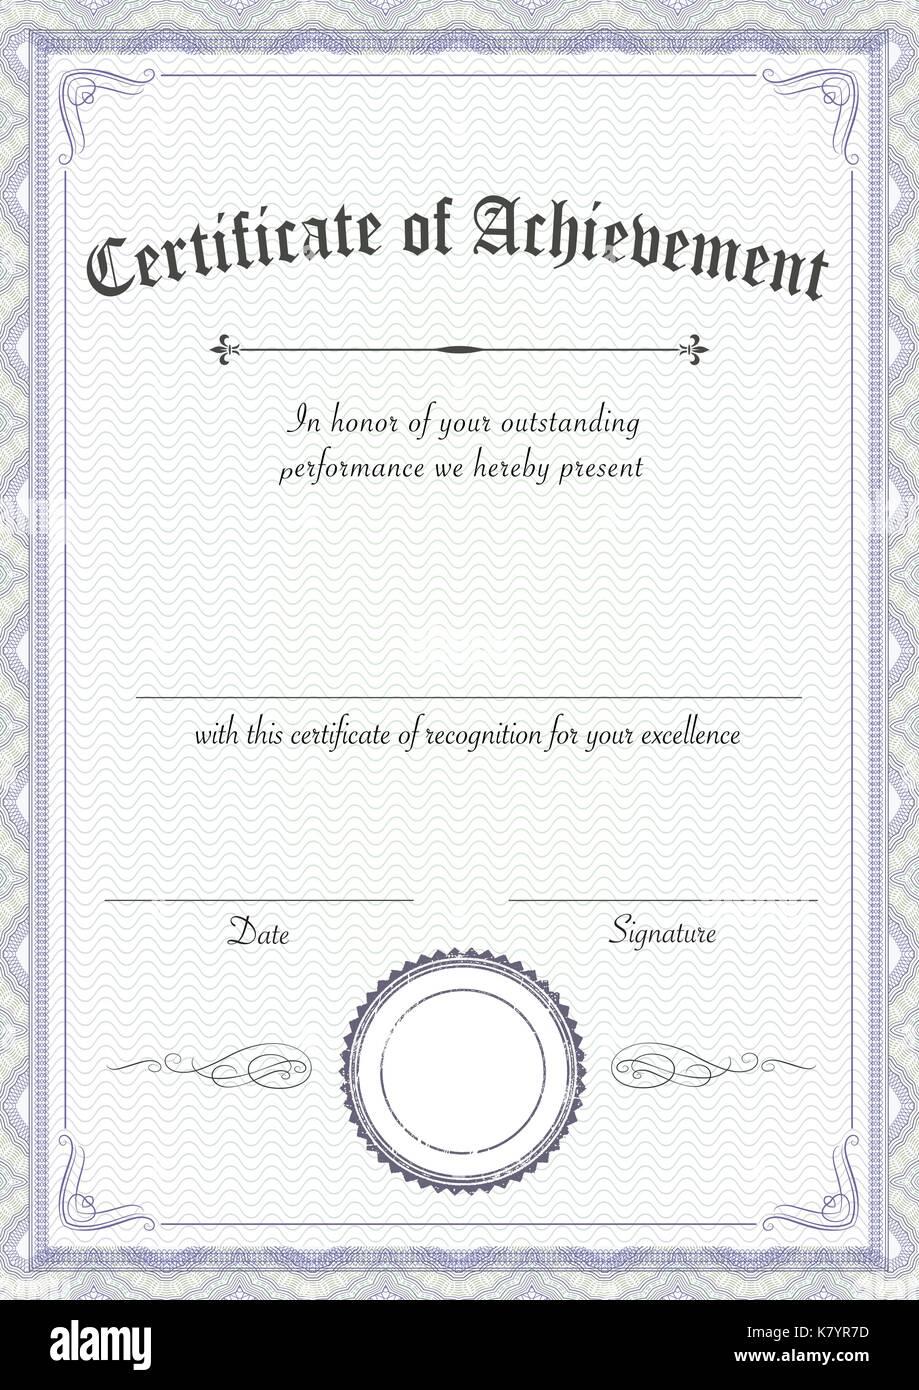 Award Certificate Template Stockfotos und -bilder Kaufen - Seite 24 In Award Of Excellence Certificate Template